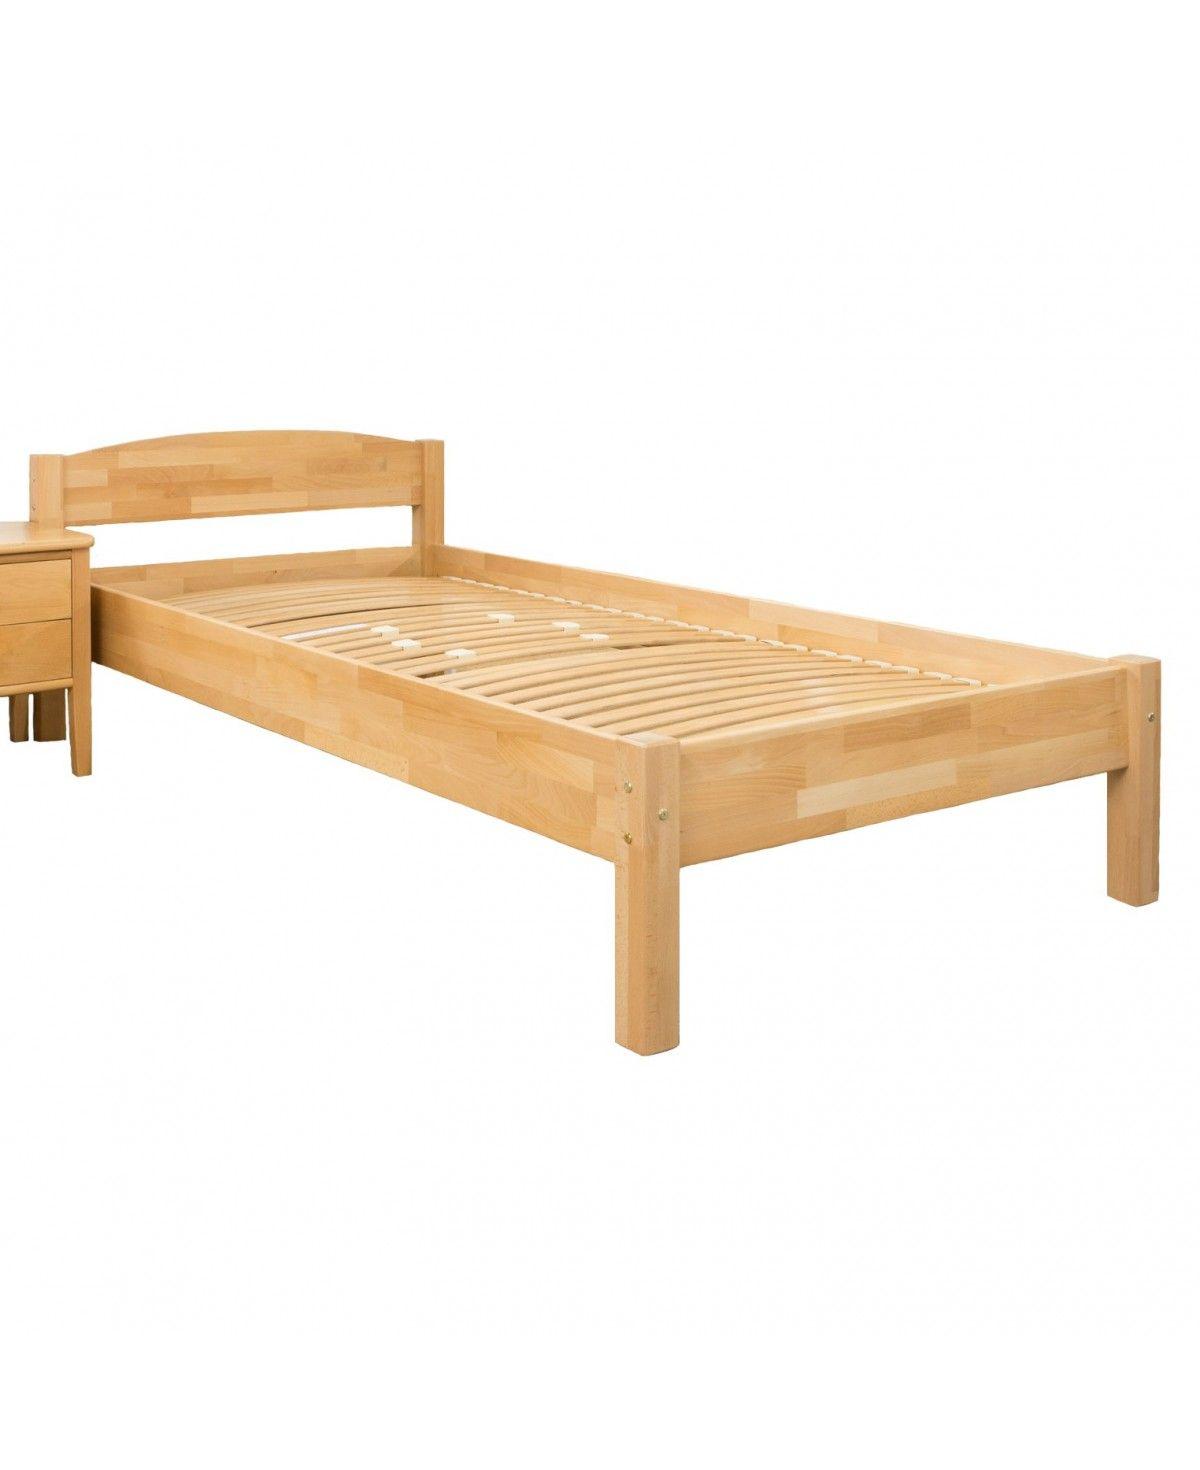 Massivholz Betten 140x200: Bettgestell Buche Massivholz Mit Kopfteil 140x200